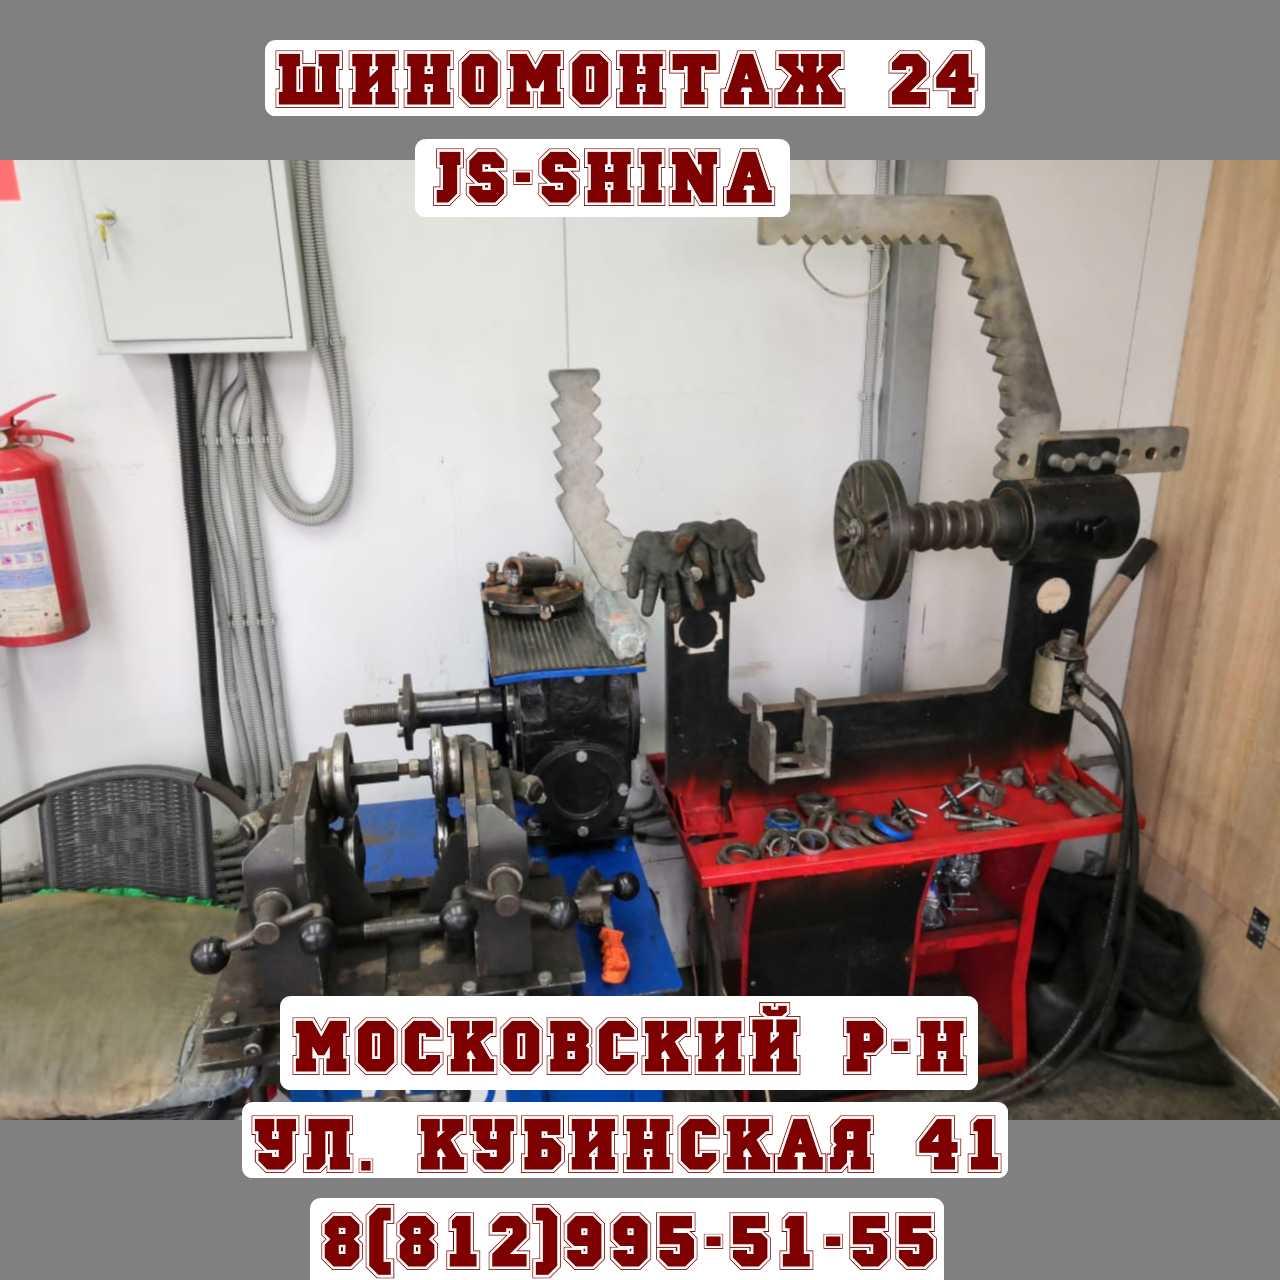 Шиномонтаж 24 в СПб Московский район JS-Shina